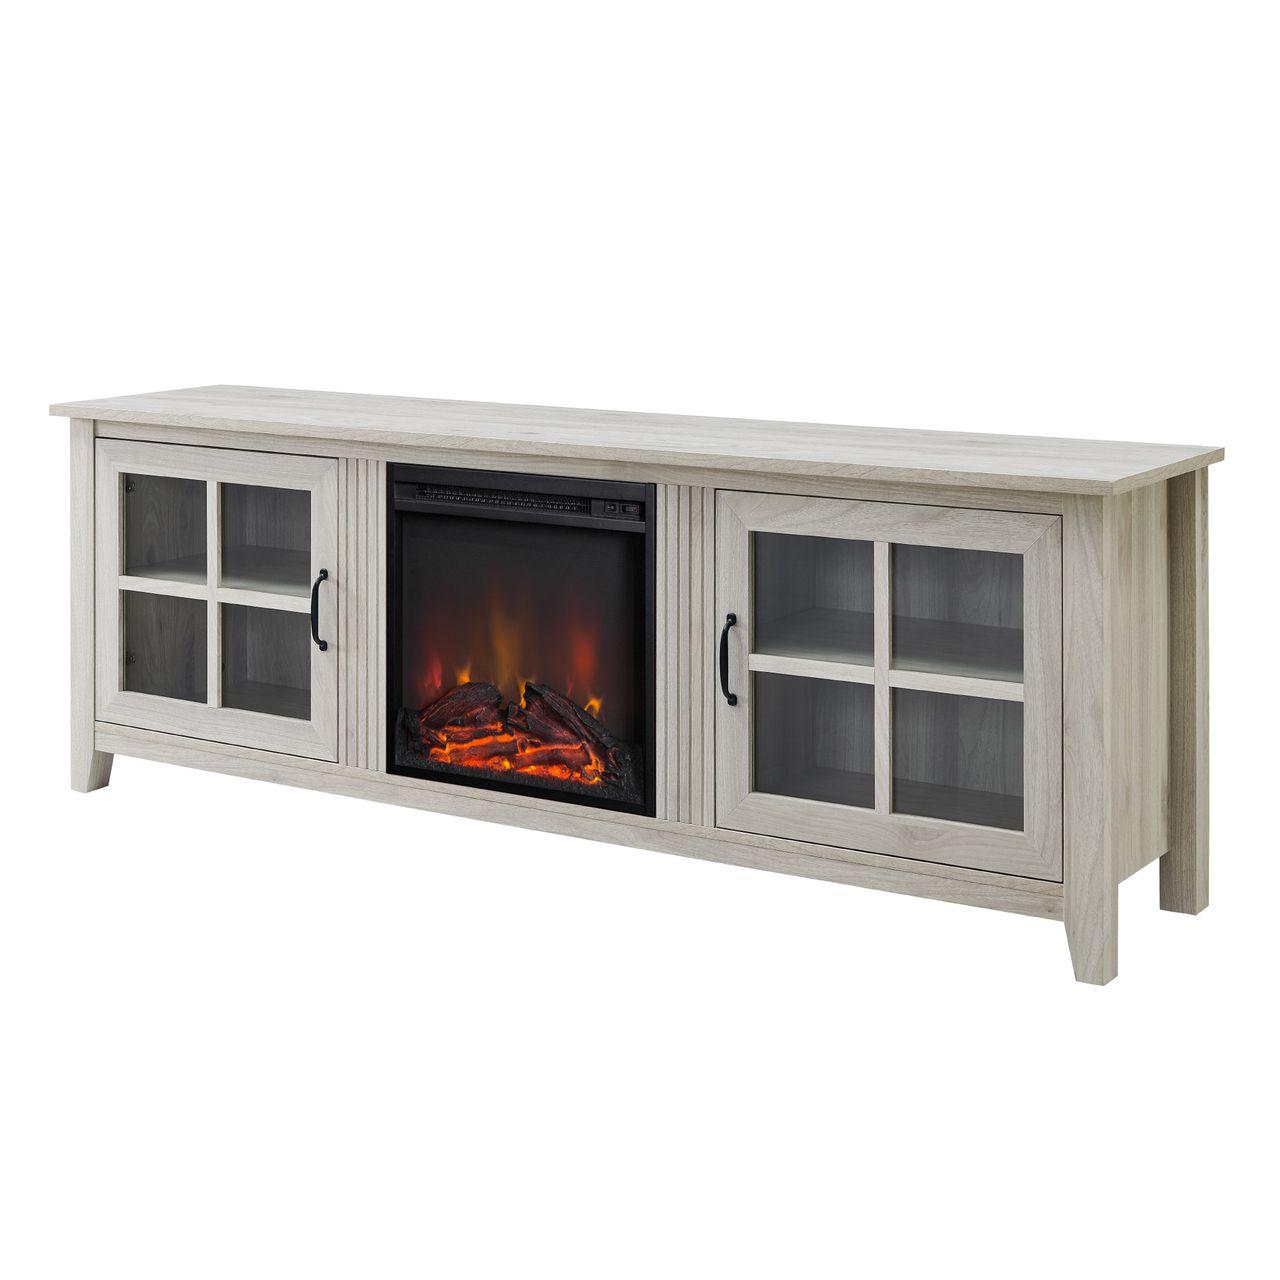 "Walker Edison 70"" Glass Door Fireplace TV Console - Birch"